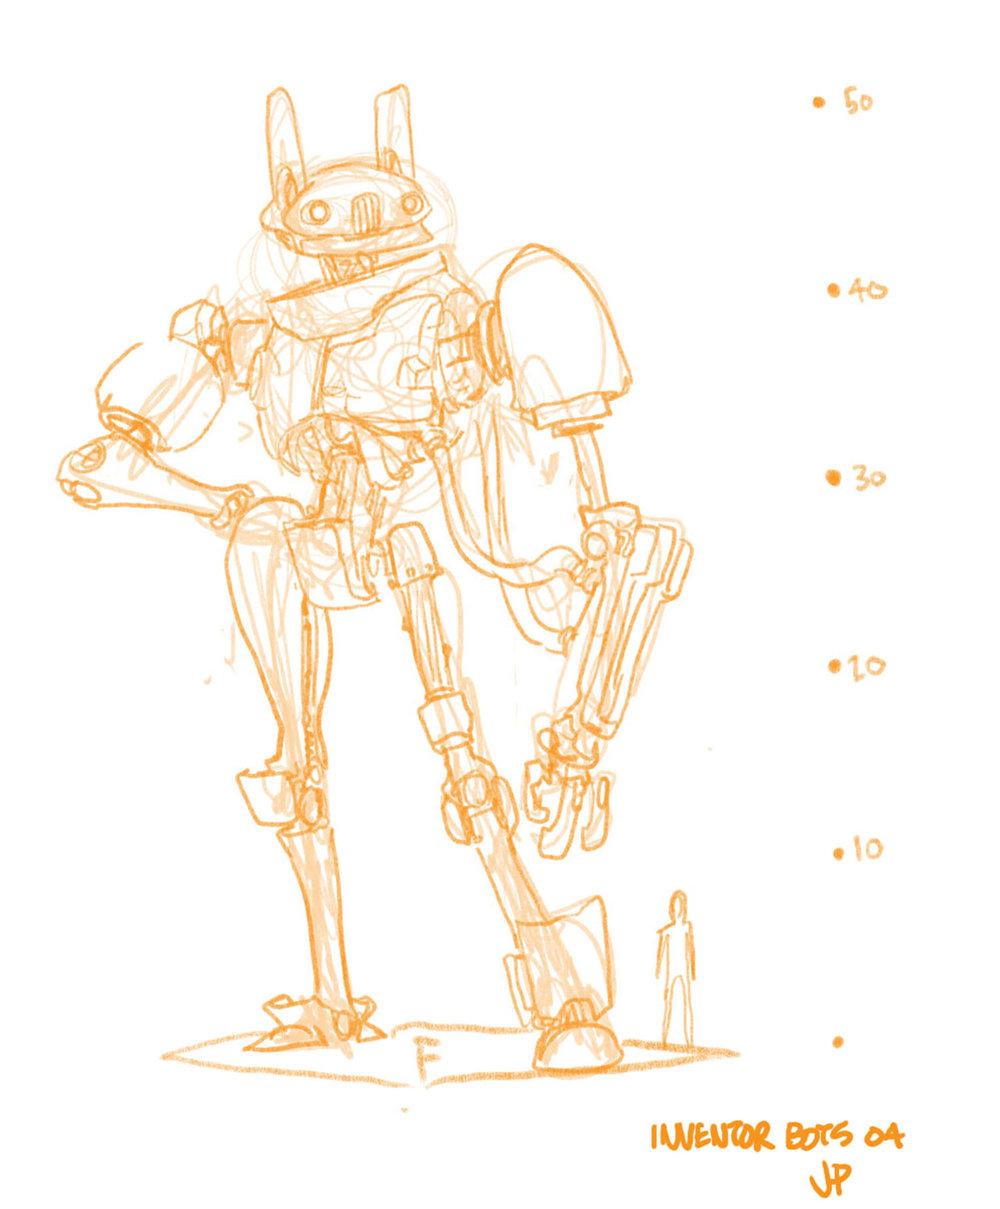 inventor_sketches04.jpg